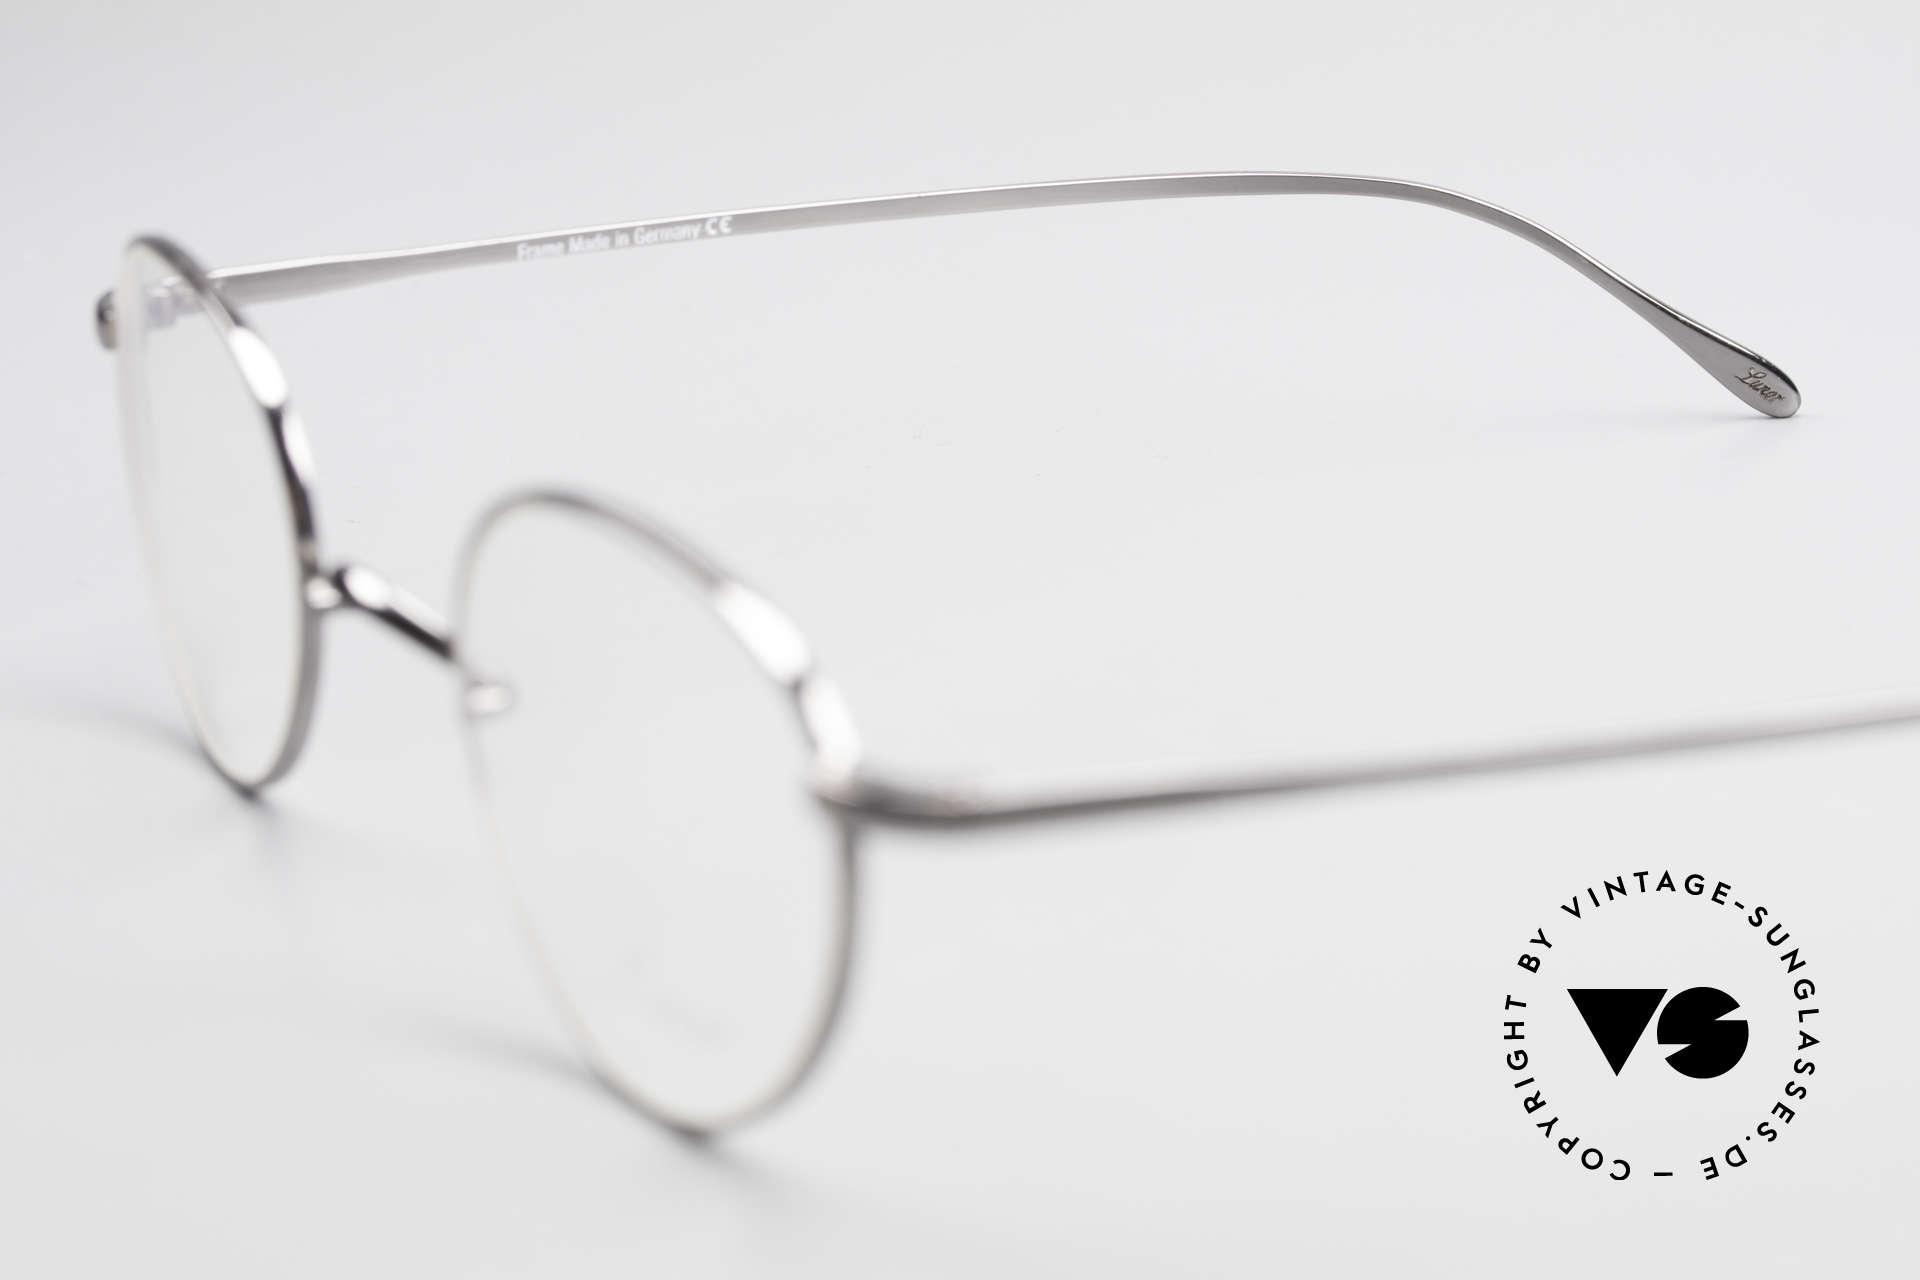 Lunor Club 501 GM Metal Glasses Anatomic Bridge, Size: small, Made for Men and Women